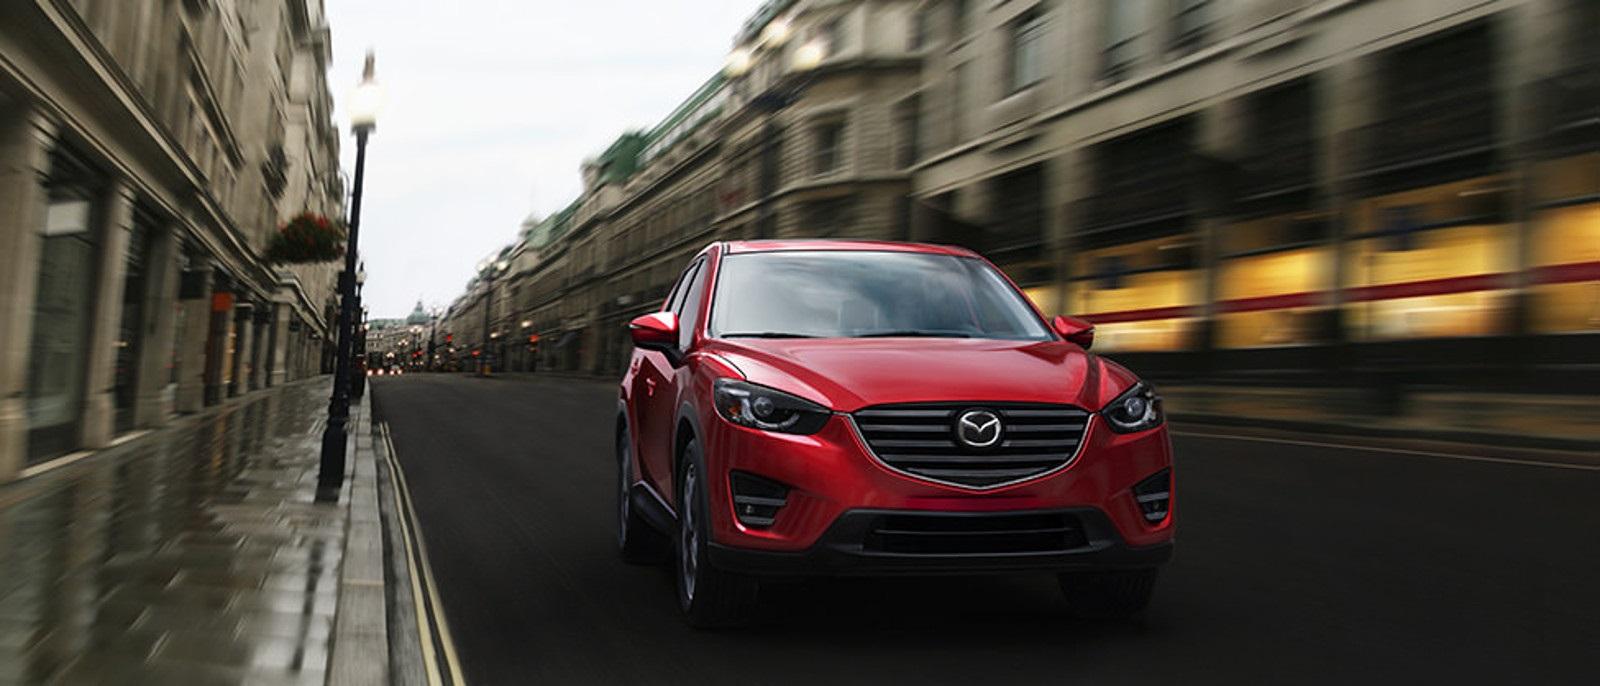 2016 Mazda CX-5 red paint city scene